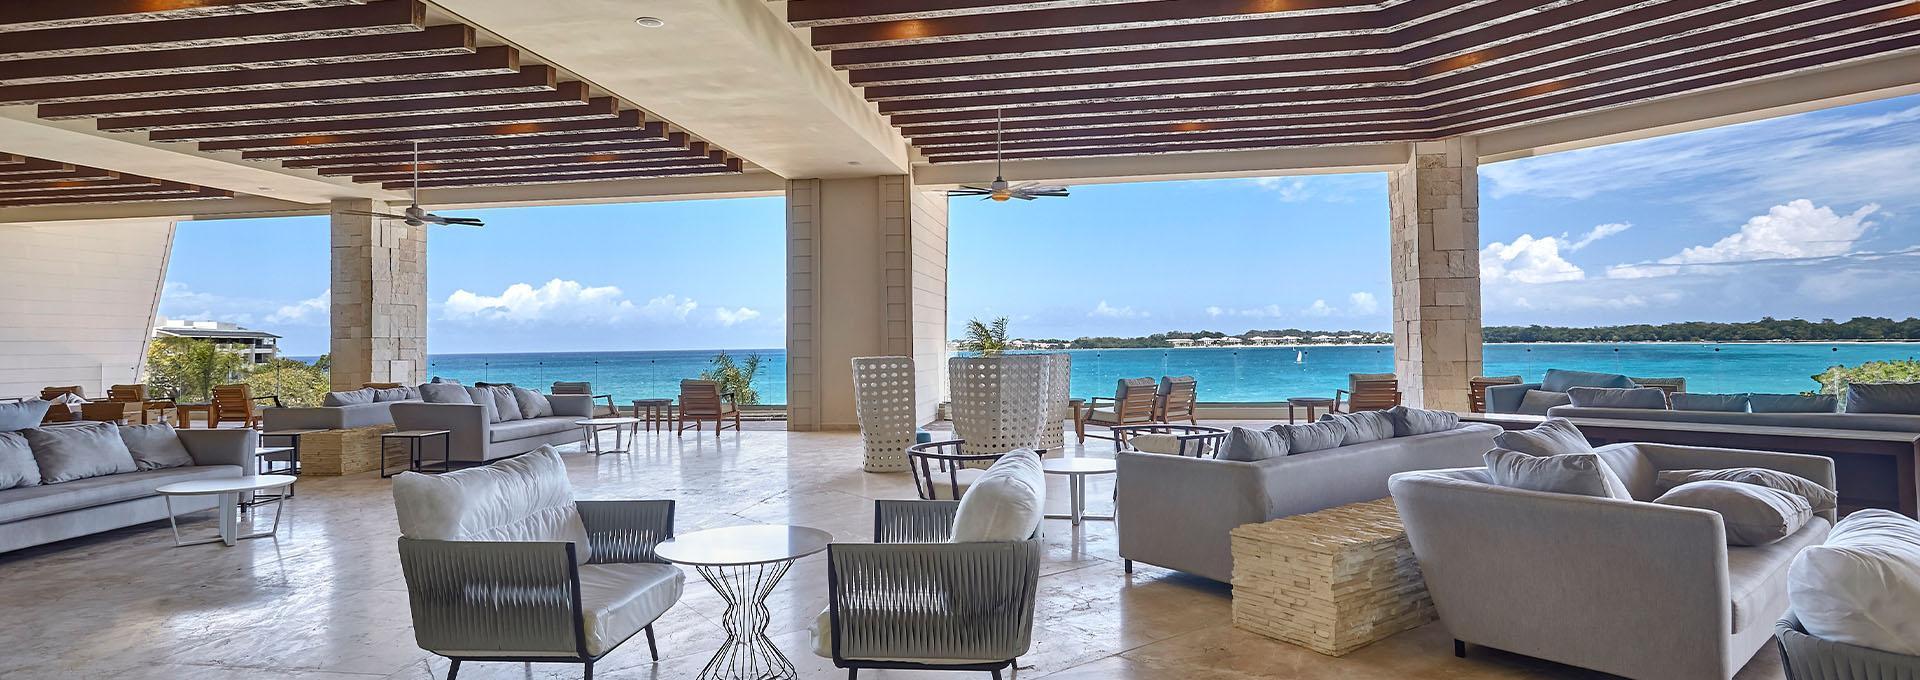 Blue Diamond resort in Negril, Jamaica